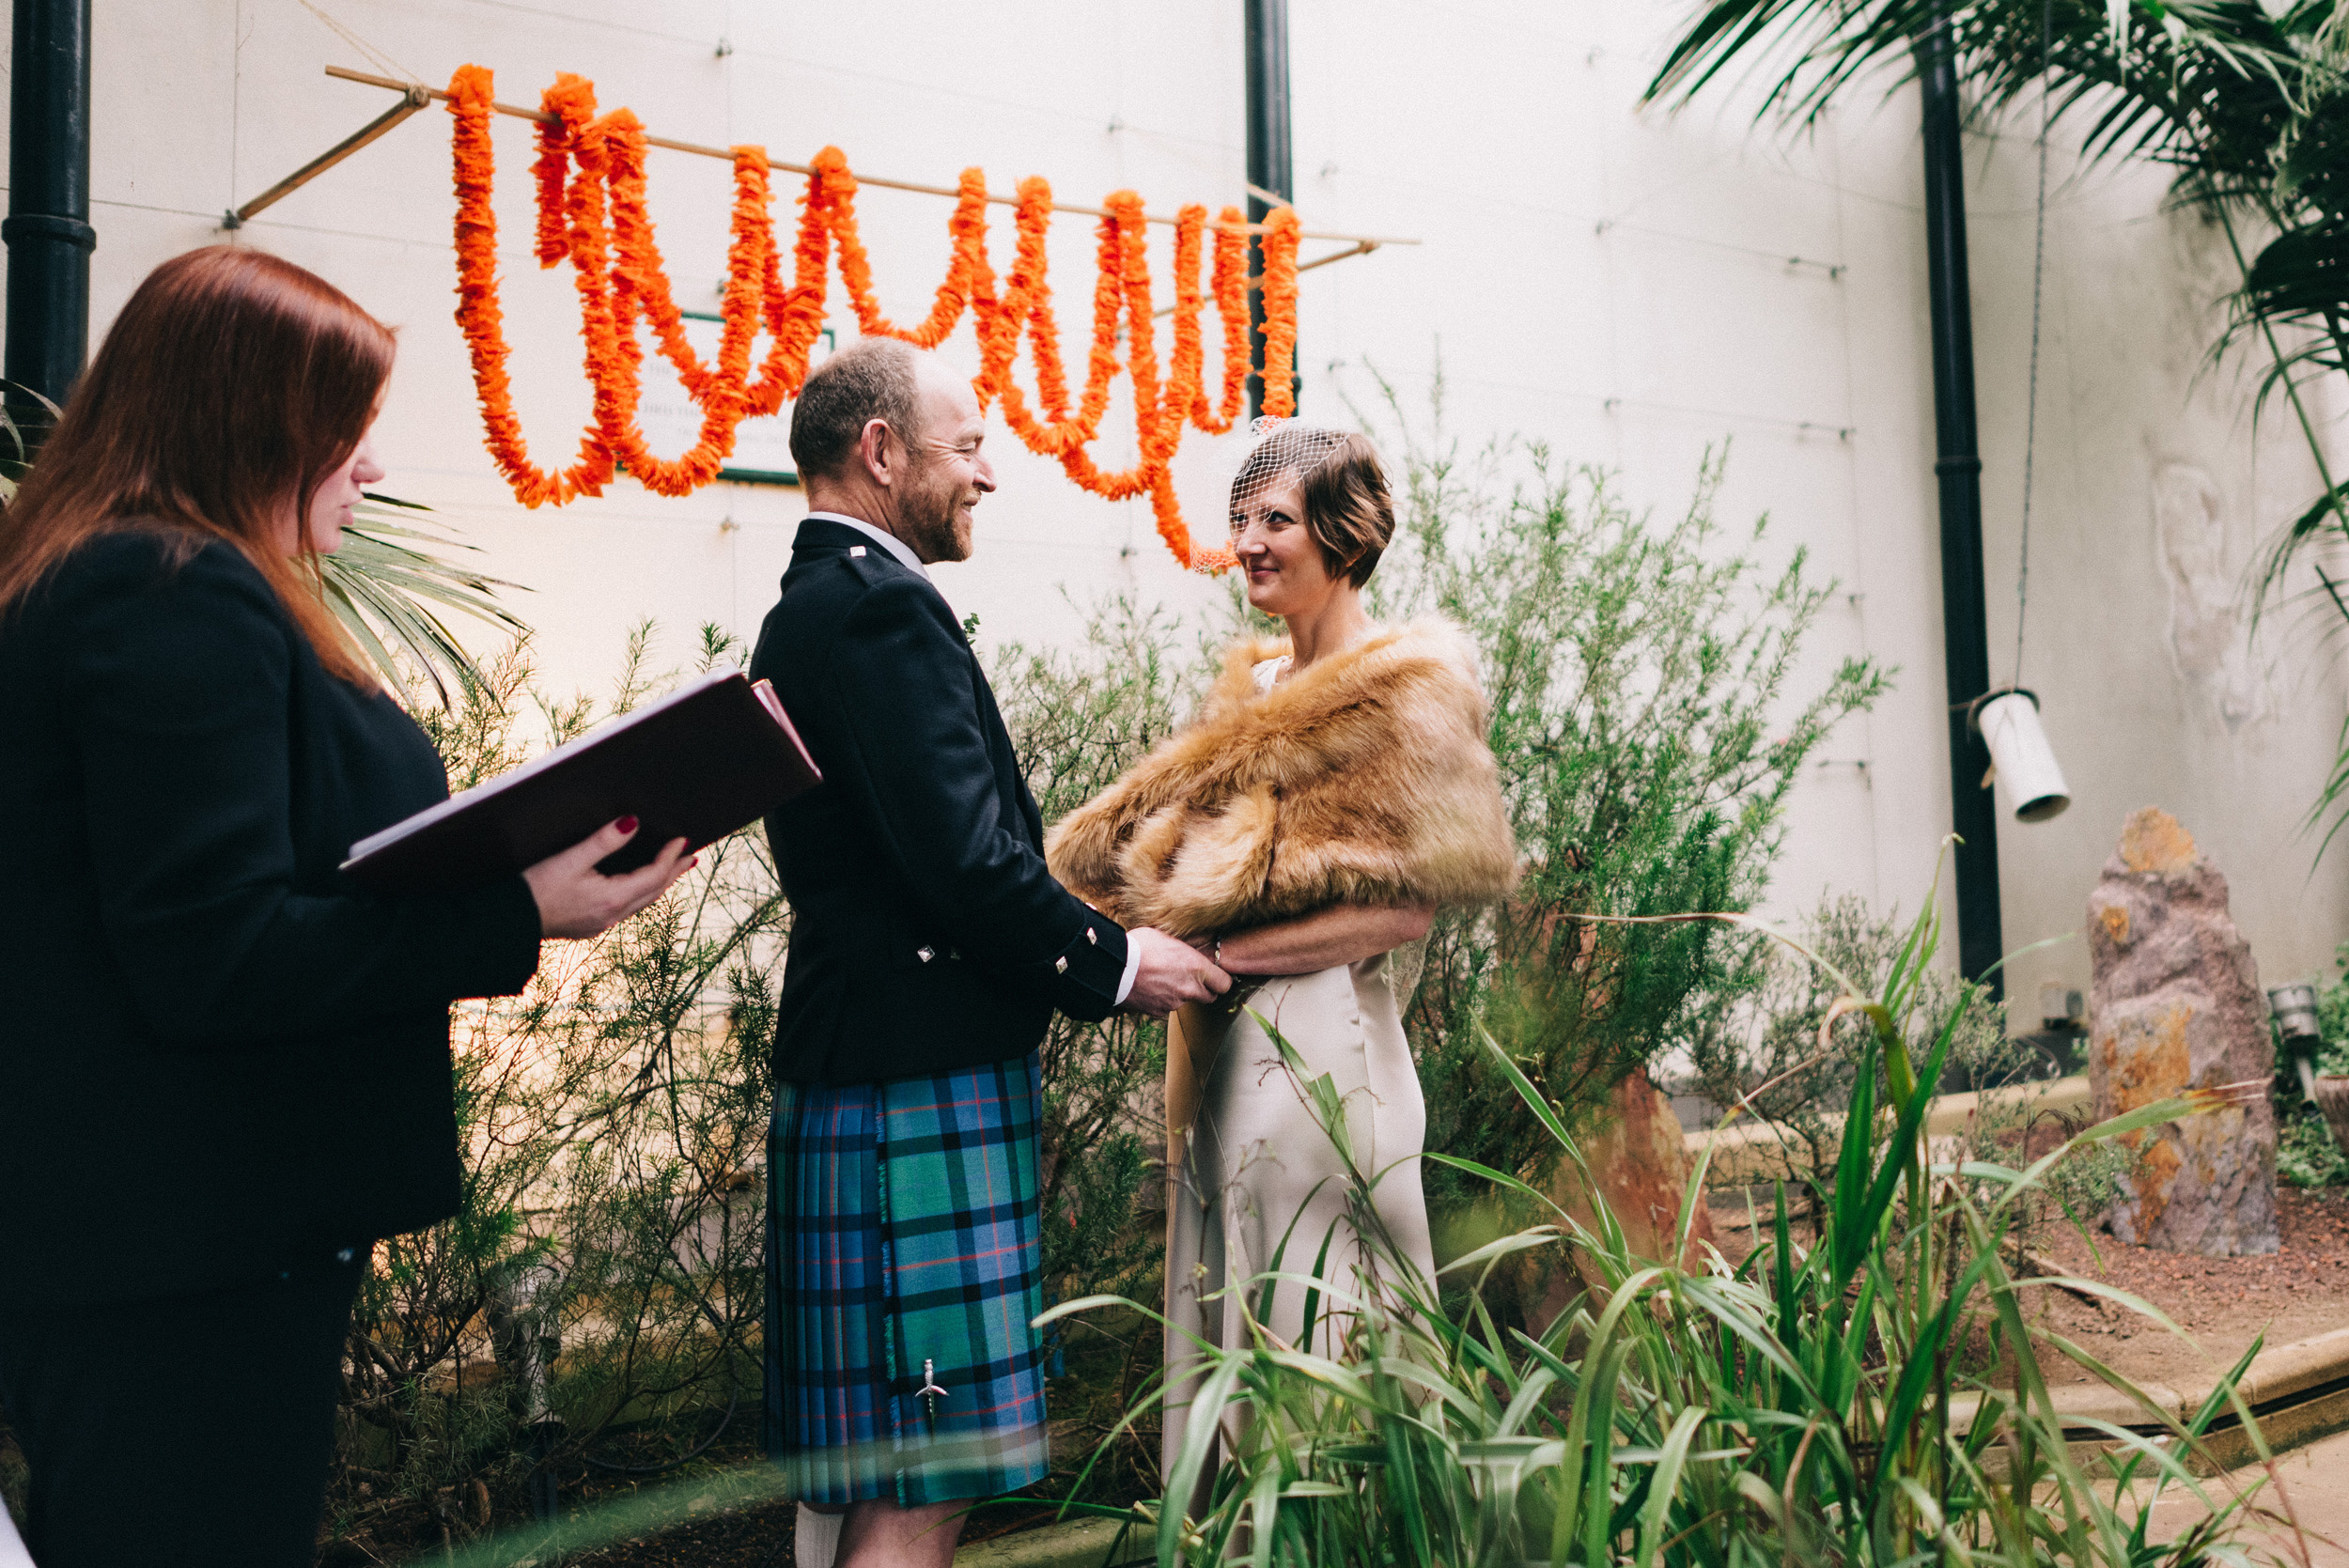 Alice-Bias-Cut-Silk-Wedding-Dress-Kate-Beaumont-Sheffield-Botanical-Gardens-by-Peakography-10.jpg